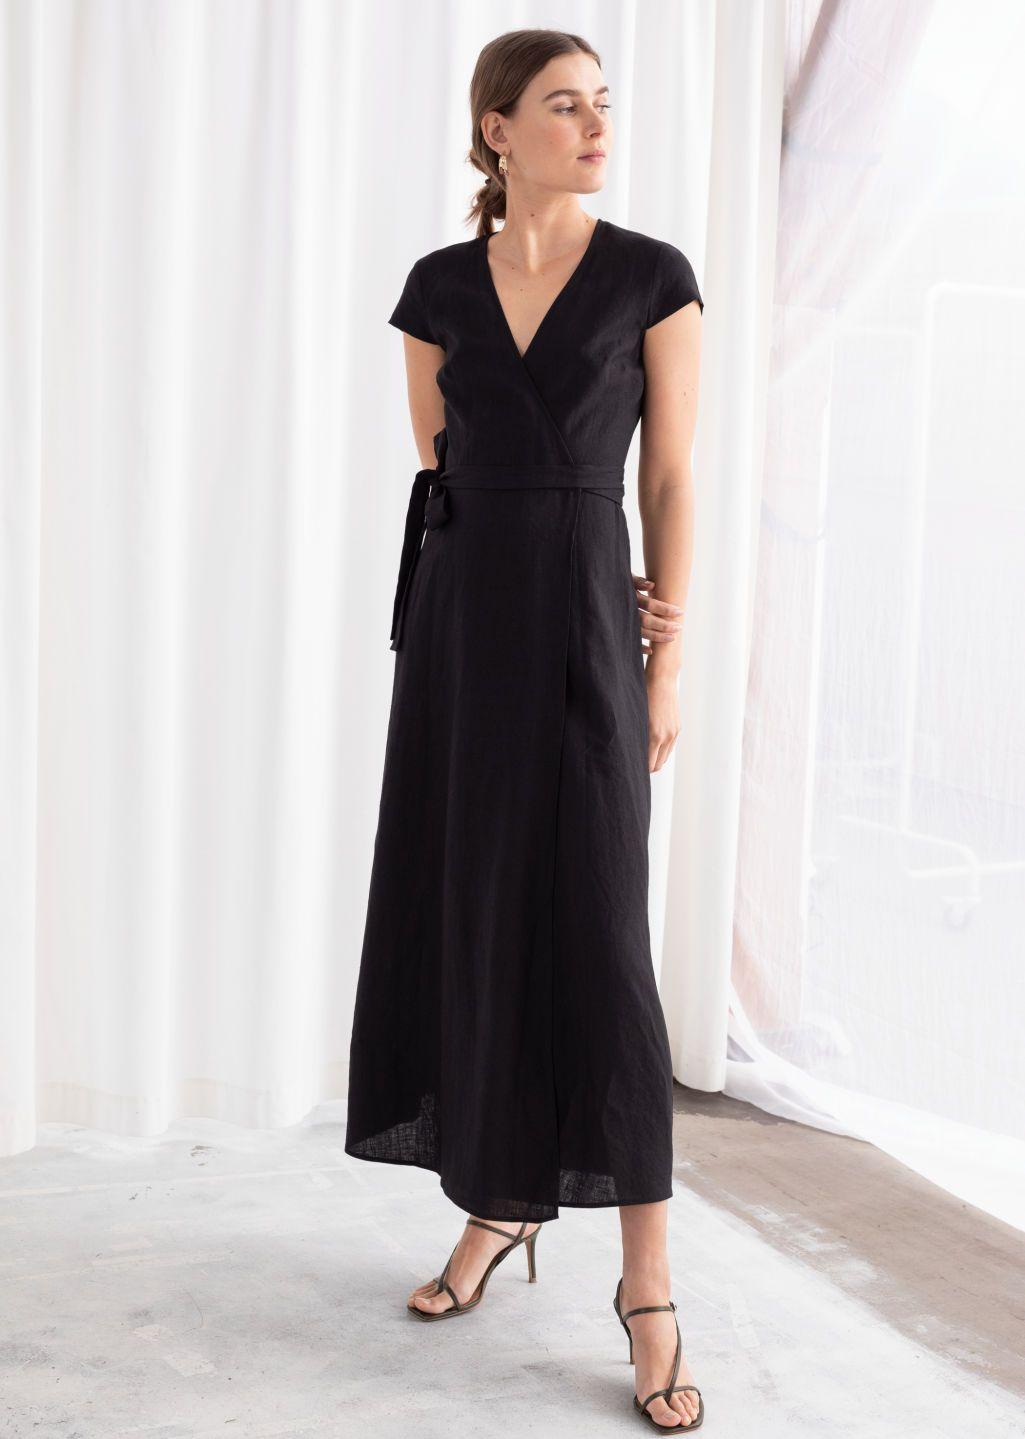 Linen Midi Wrap Dress Black Midi Dresses Other Stories Dresses Midi Wrap Dress Wrap Dress [ 1439 x 1025 Pixel ]